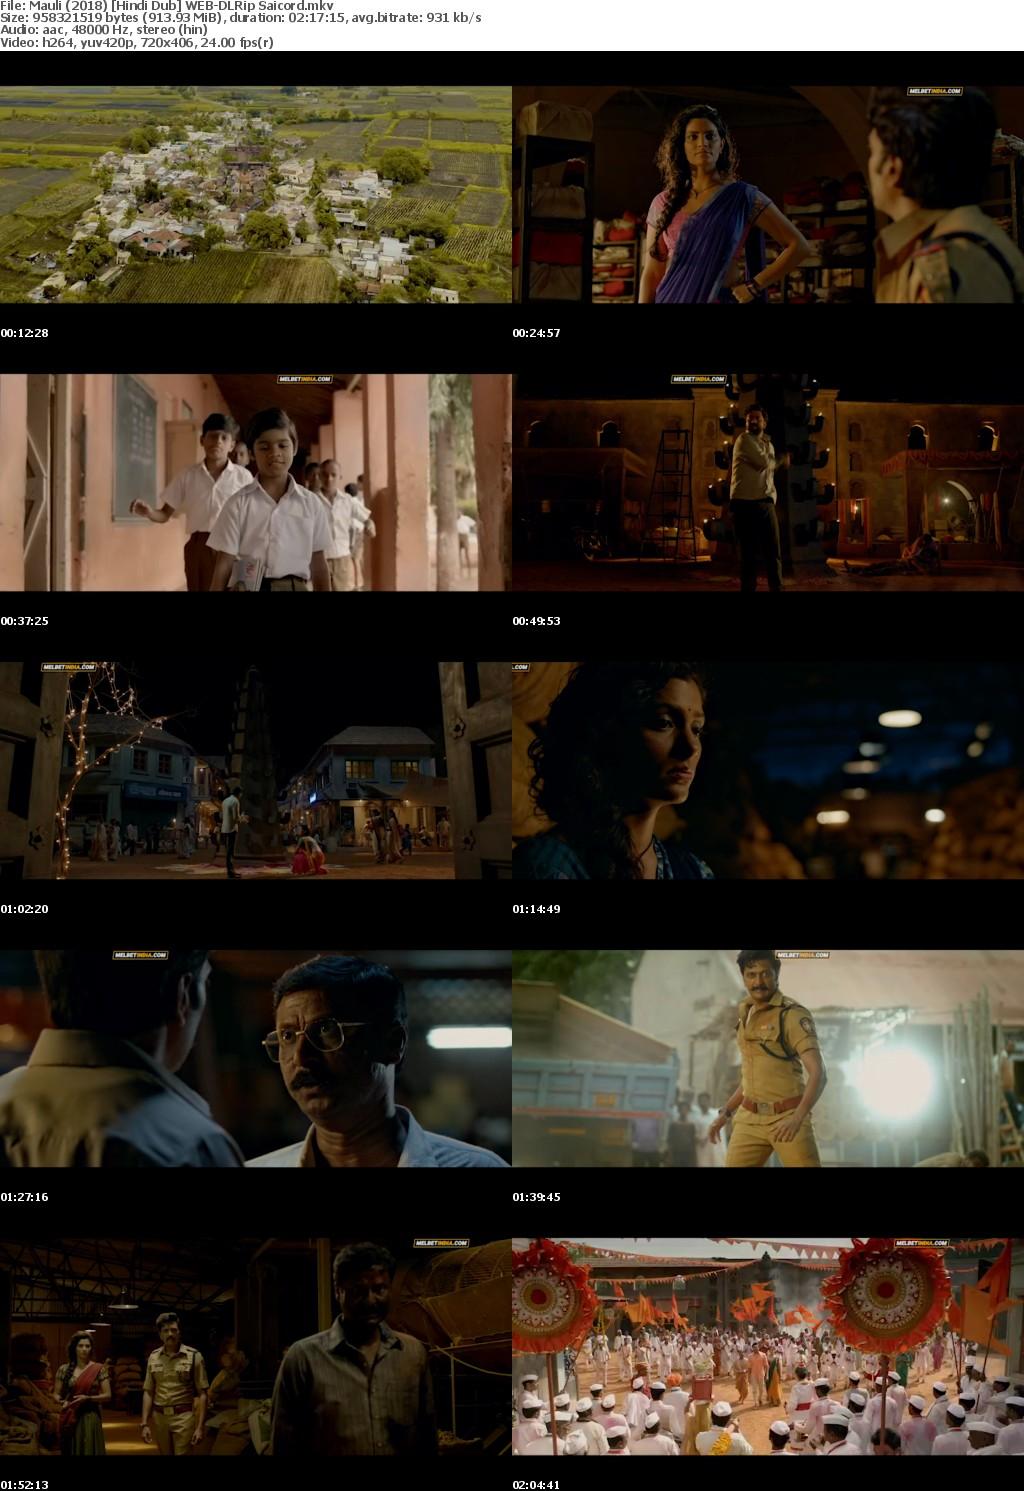 Mauli (2018) Hindi Dub WEB-DLRip Saicord